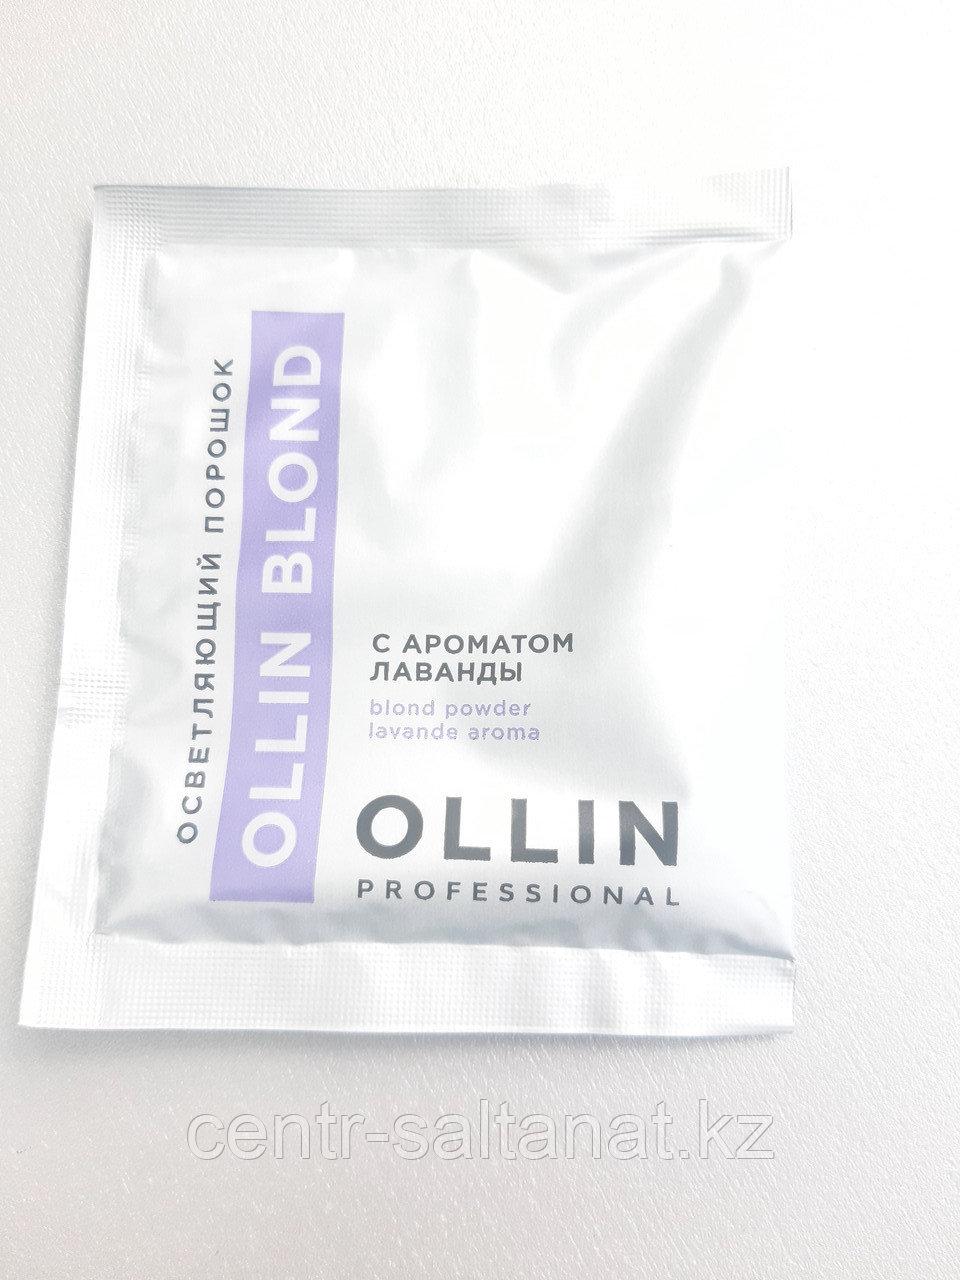 Осветляющий порошок с ароматом лаванды 30 г OLLIN